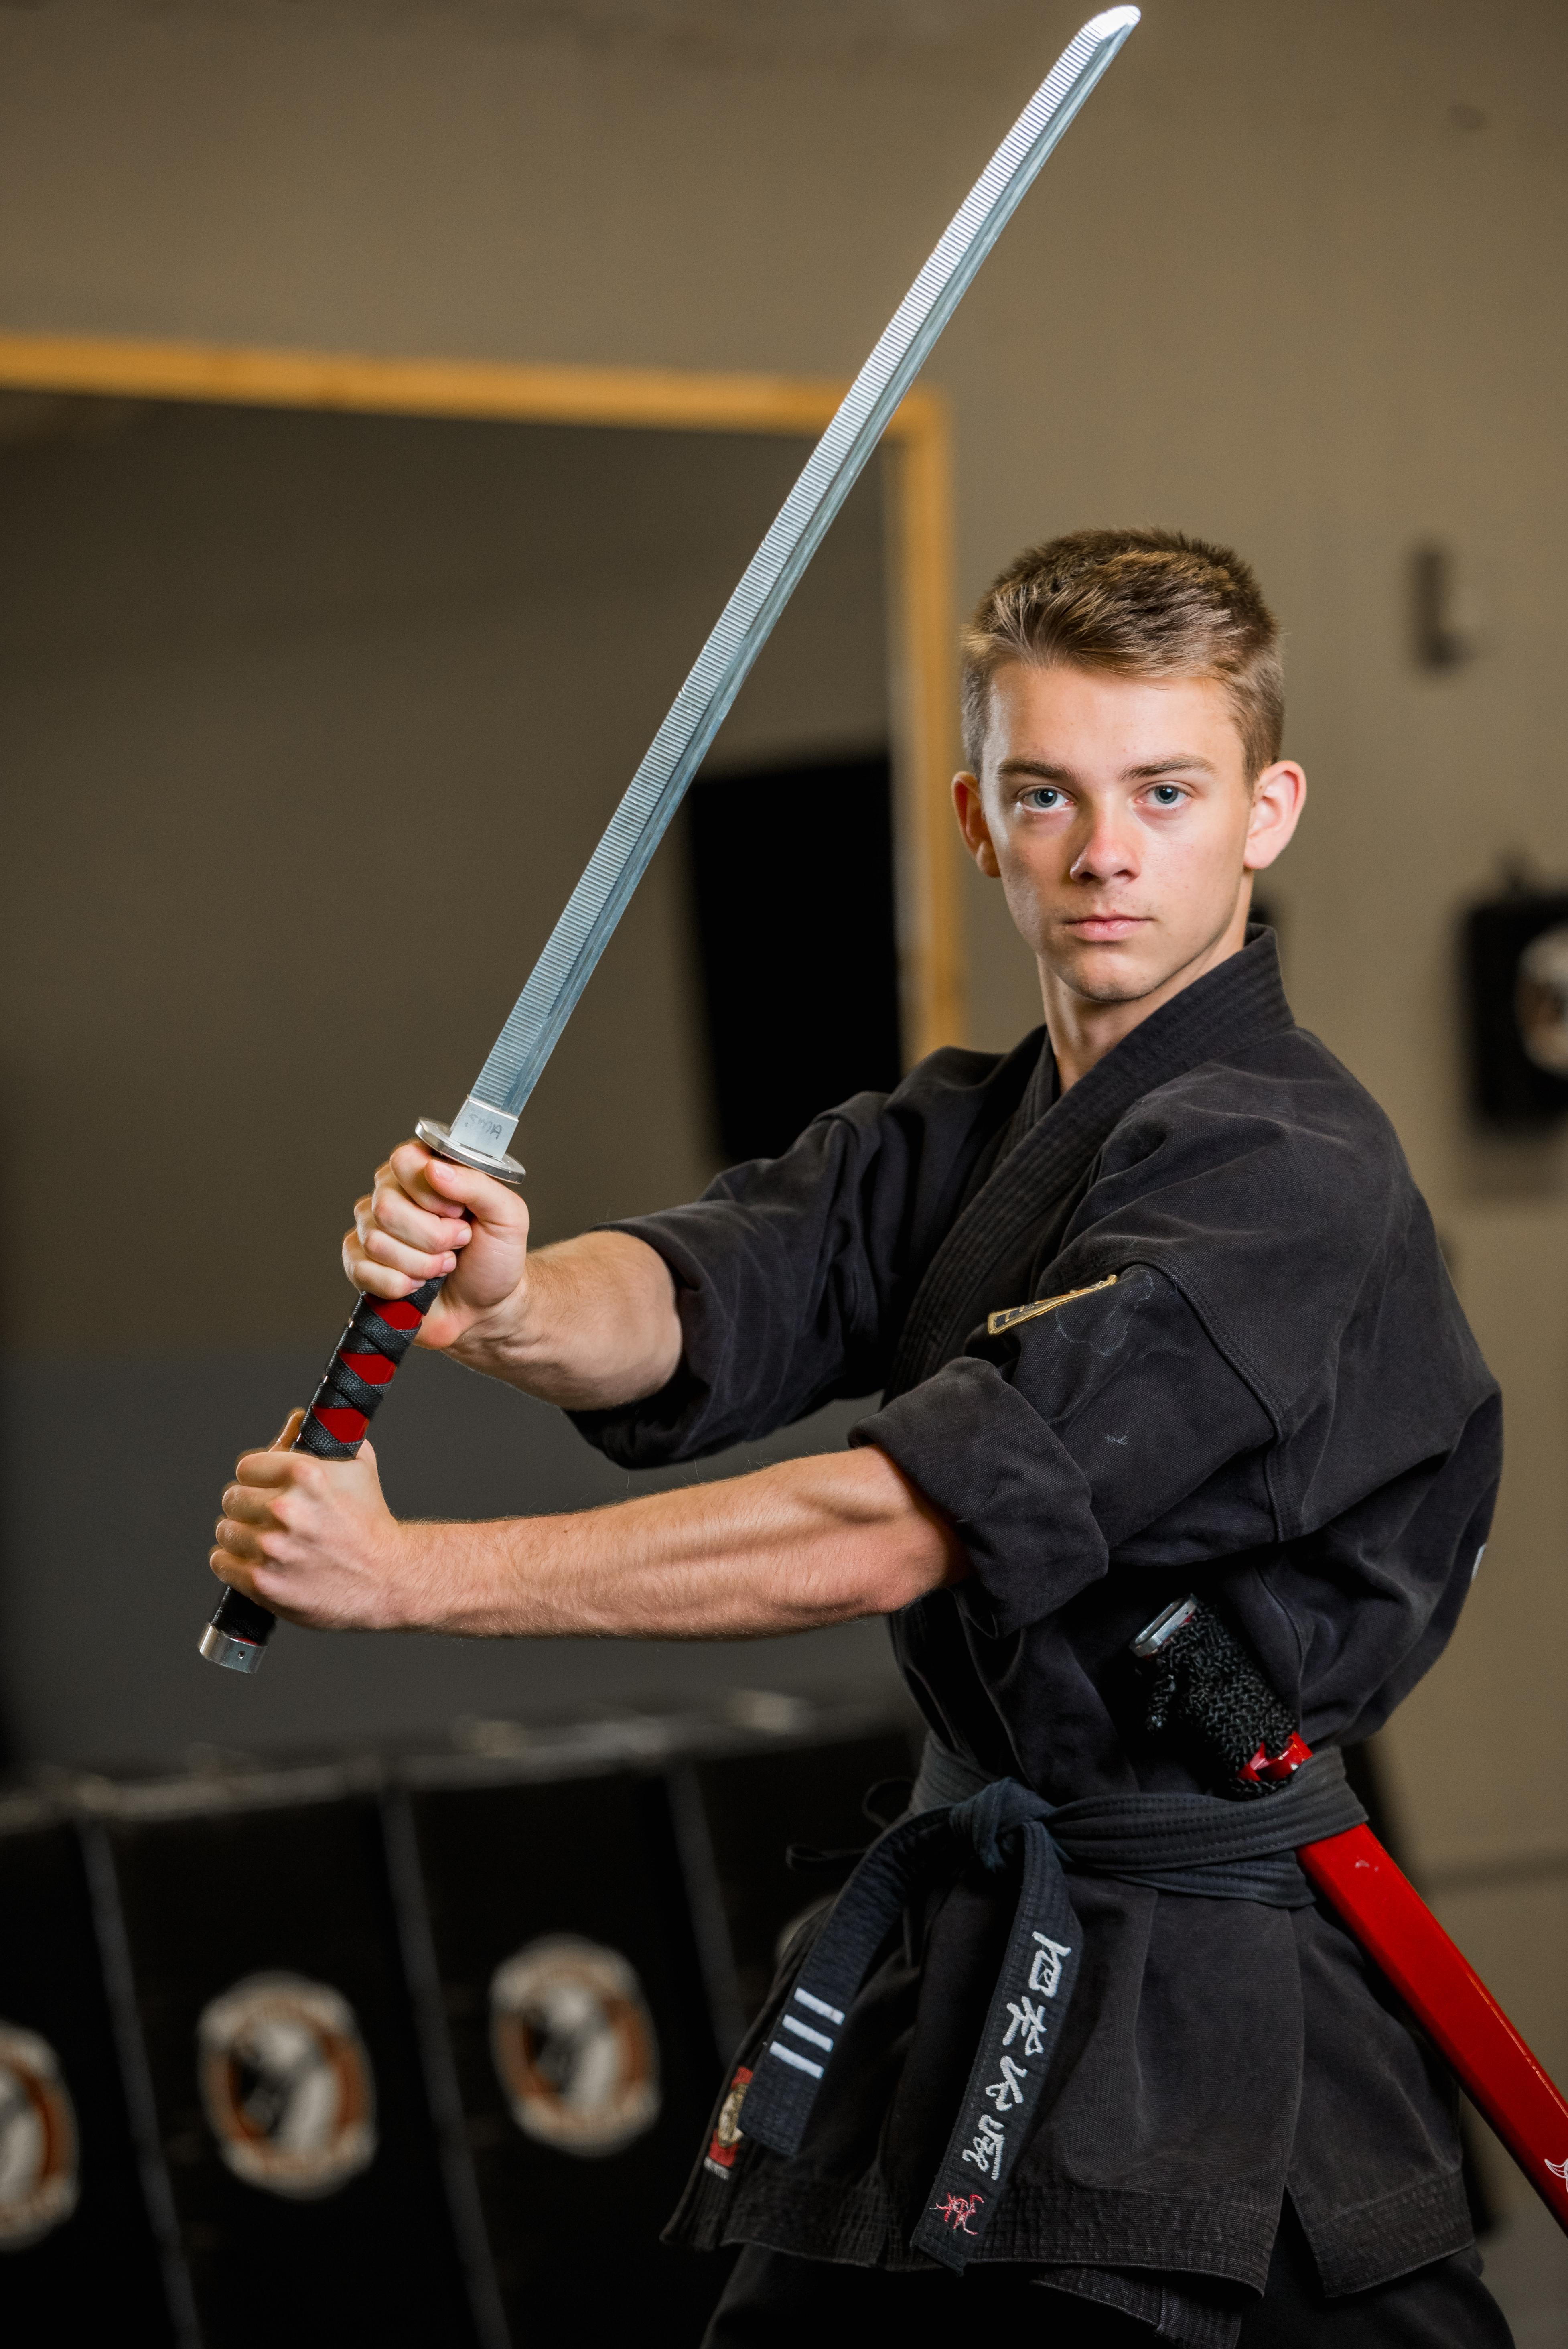 Stillwater Martial Arts Black Belt Jared Croston